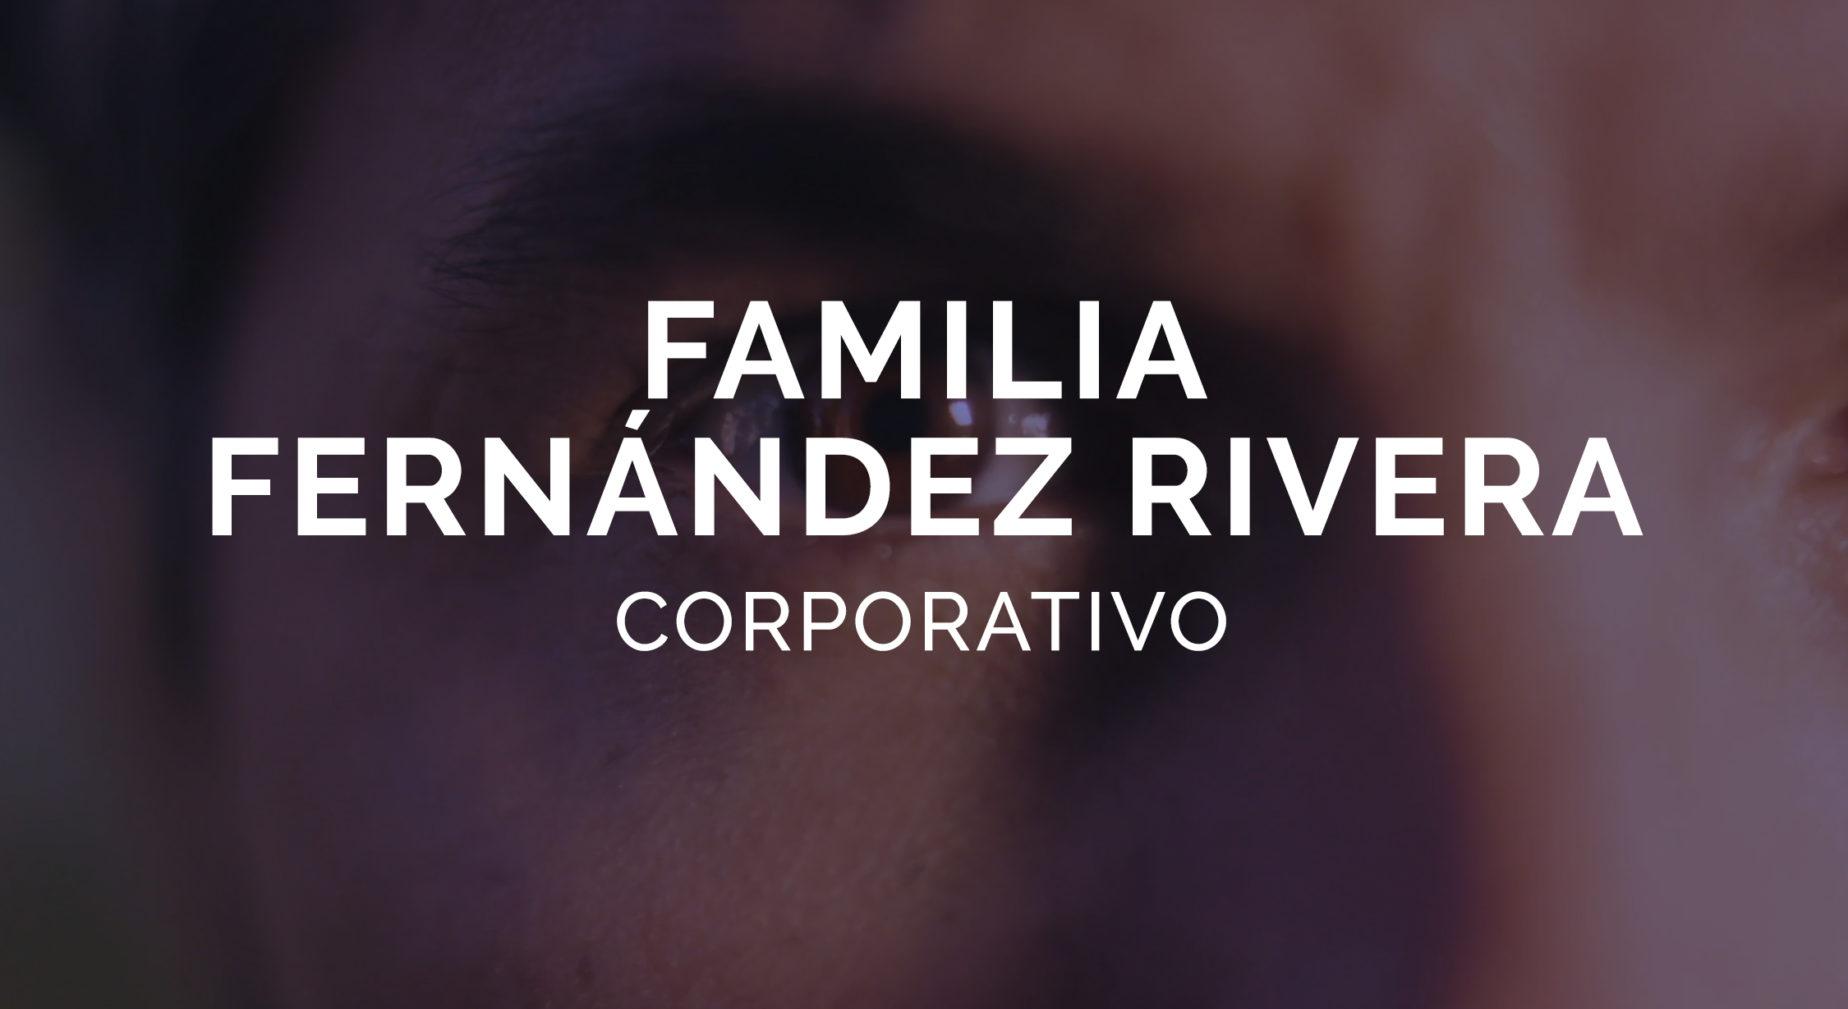 FFR Corporativo